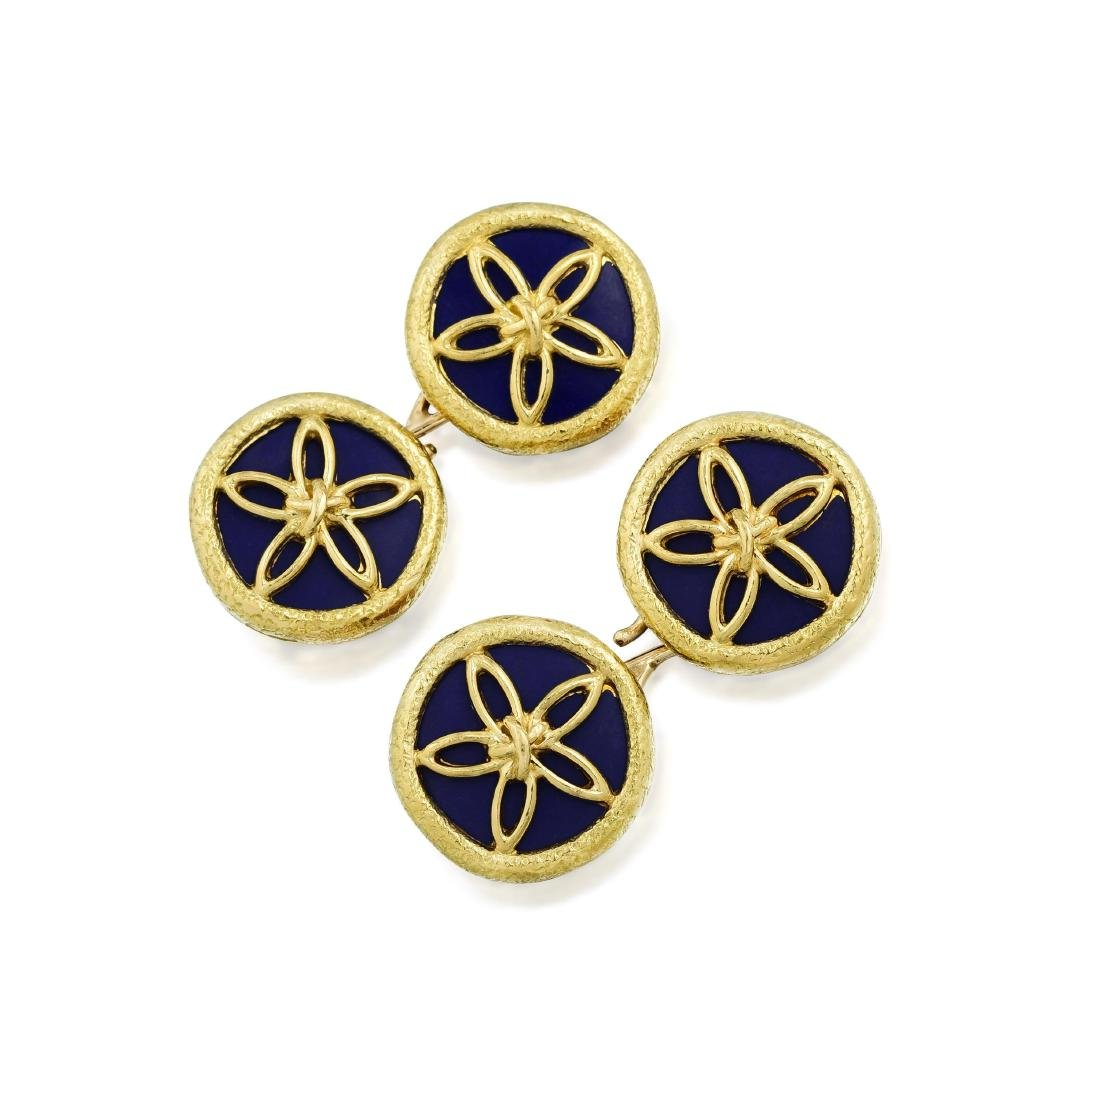 Schlumberger Tiffany & Co. Sand Dollar Enamel Cufflinks